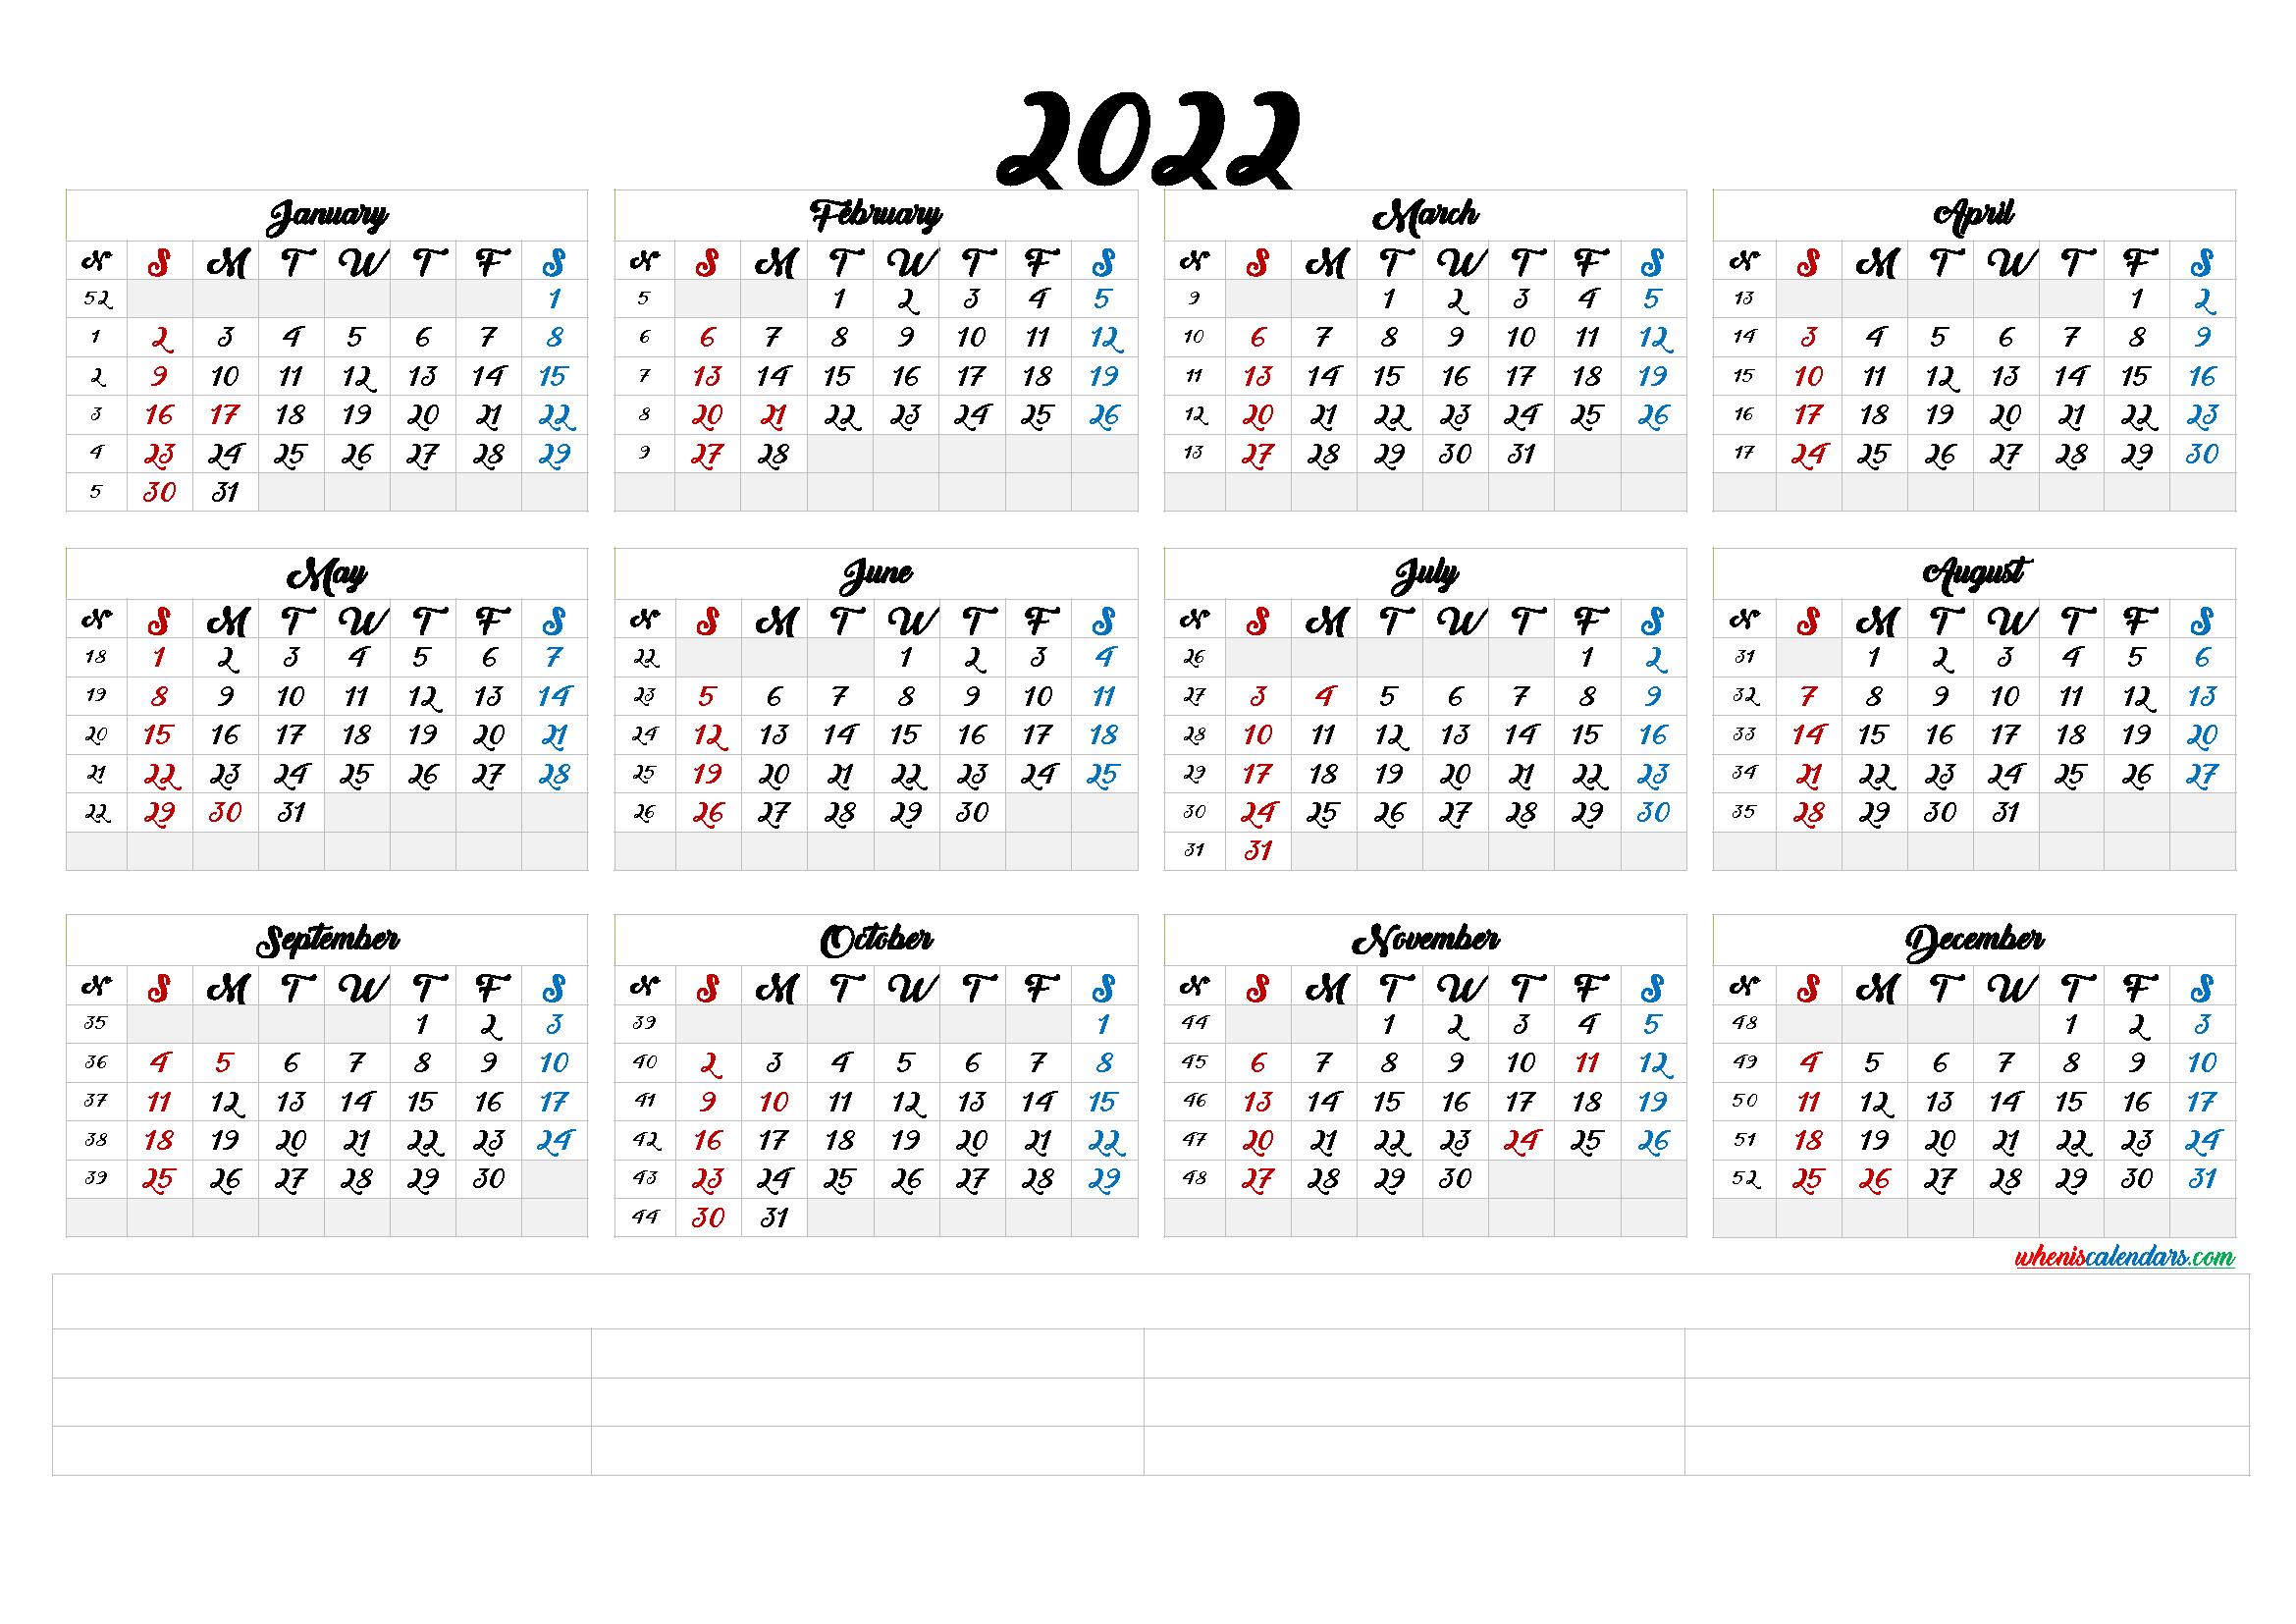 2022 Annual Calendar Printable (6 Templates) - Free ...